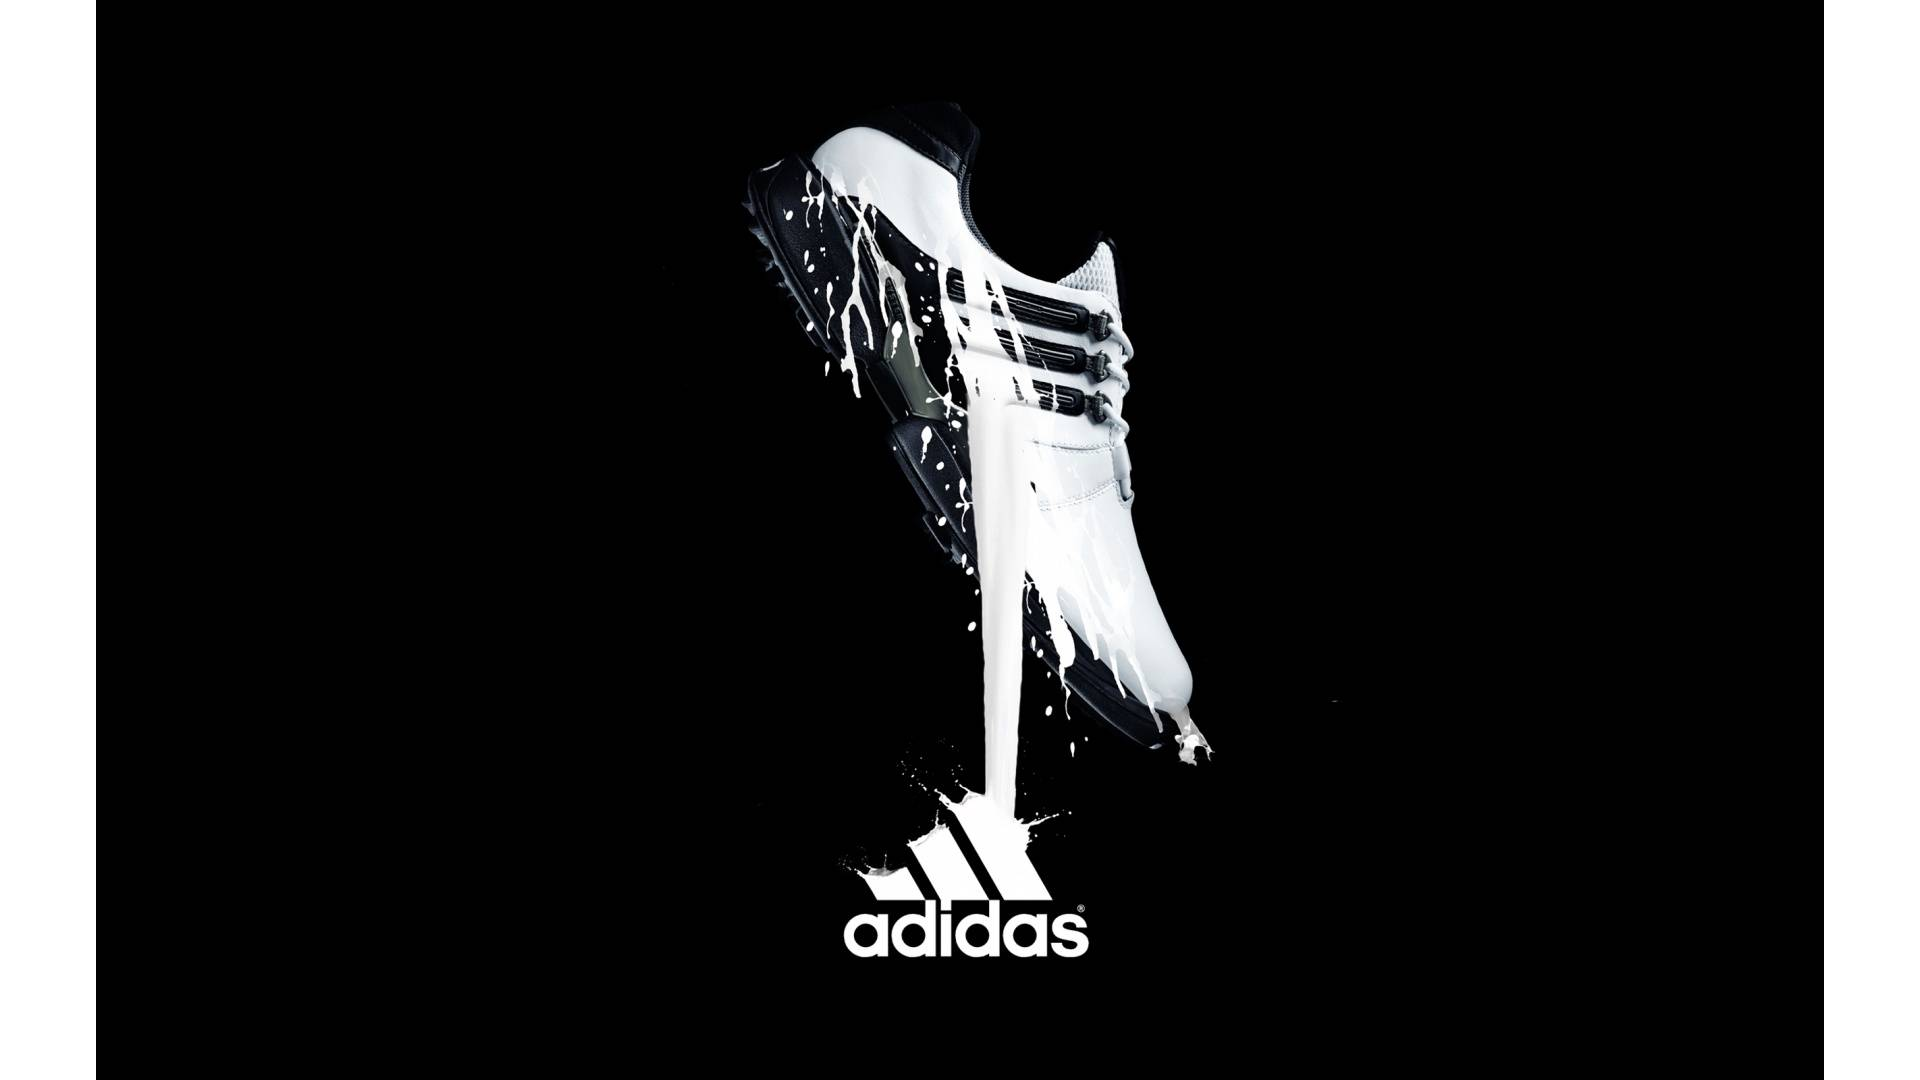 Adidas clipart high resolution 49 Adidas  Wallpapers Adidas